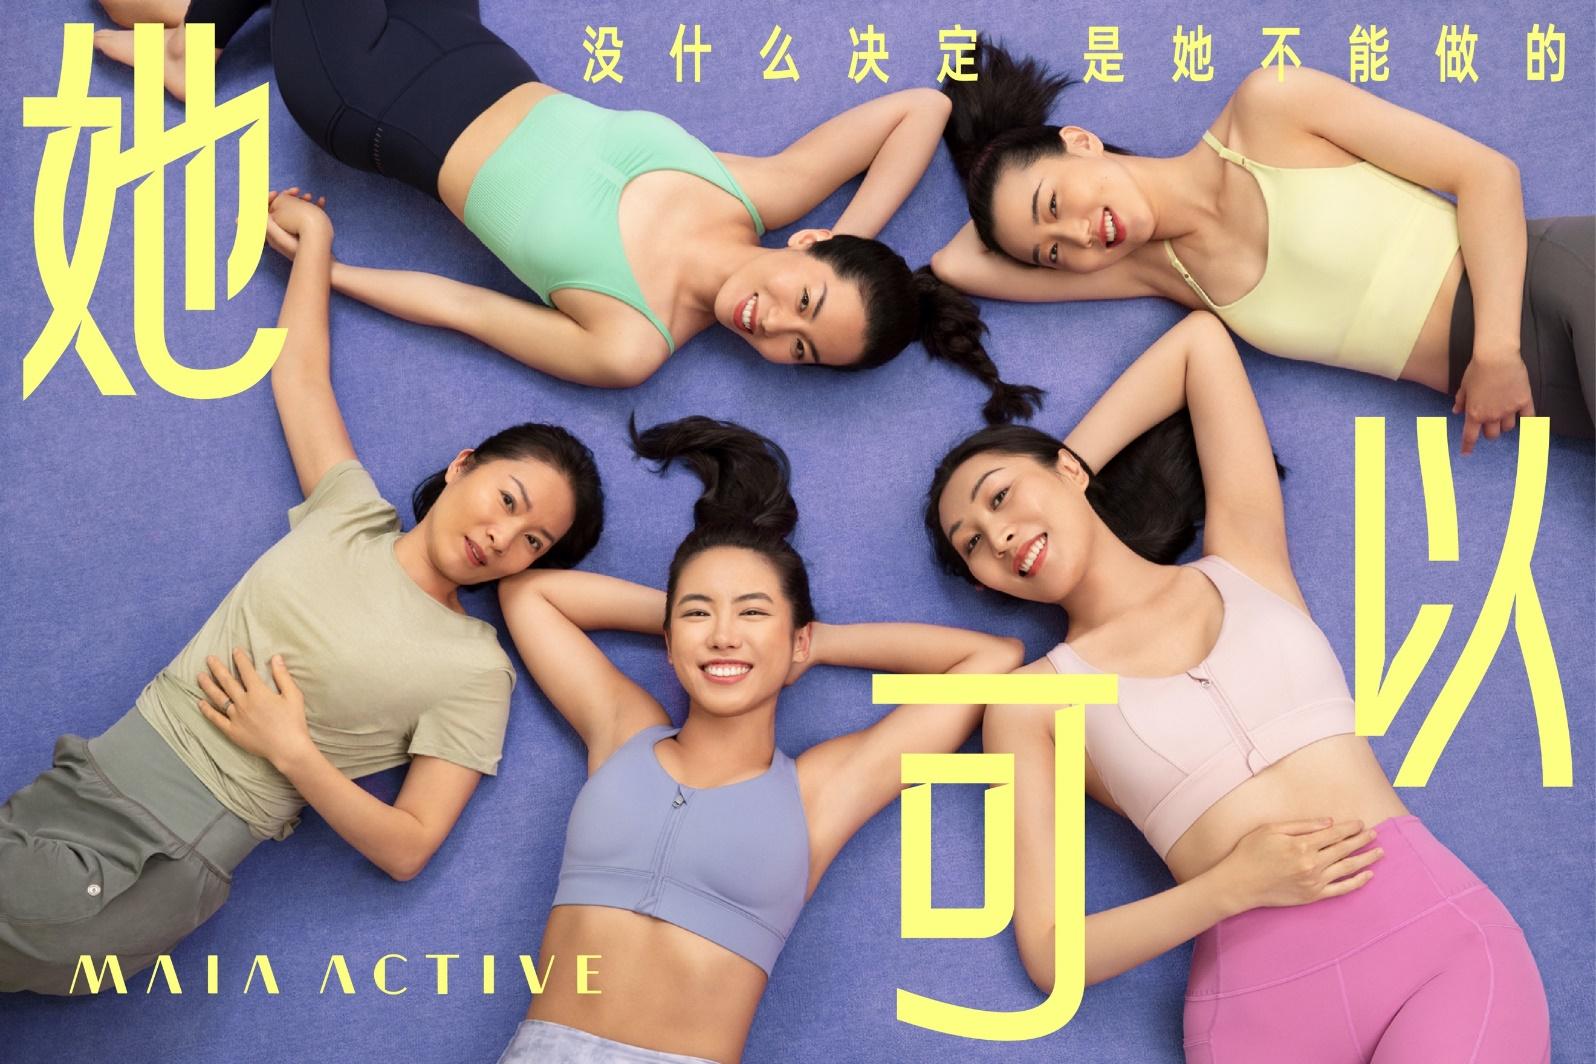 LYCRA®(莱卡®)品牌携手MAIA ACTIVE和PURE FITNESS共同举办SH'BAM®健身体验课